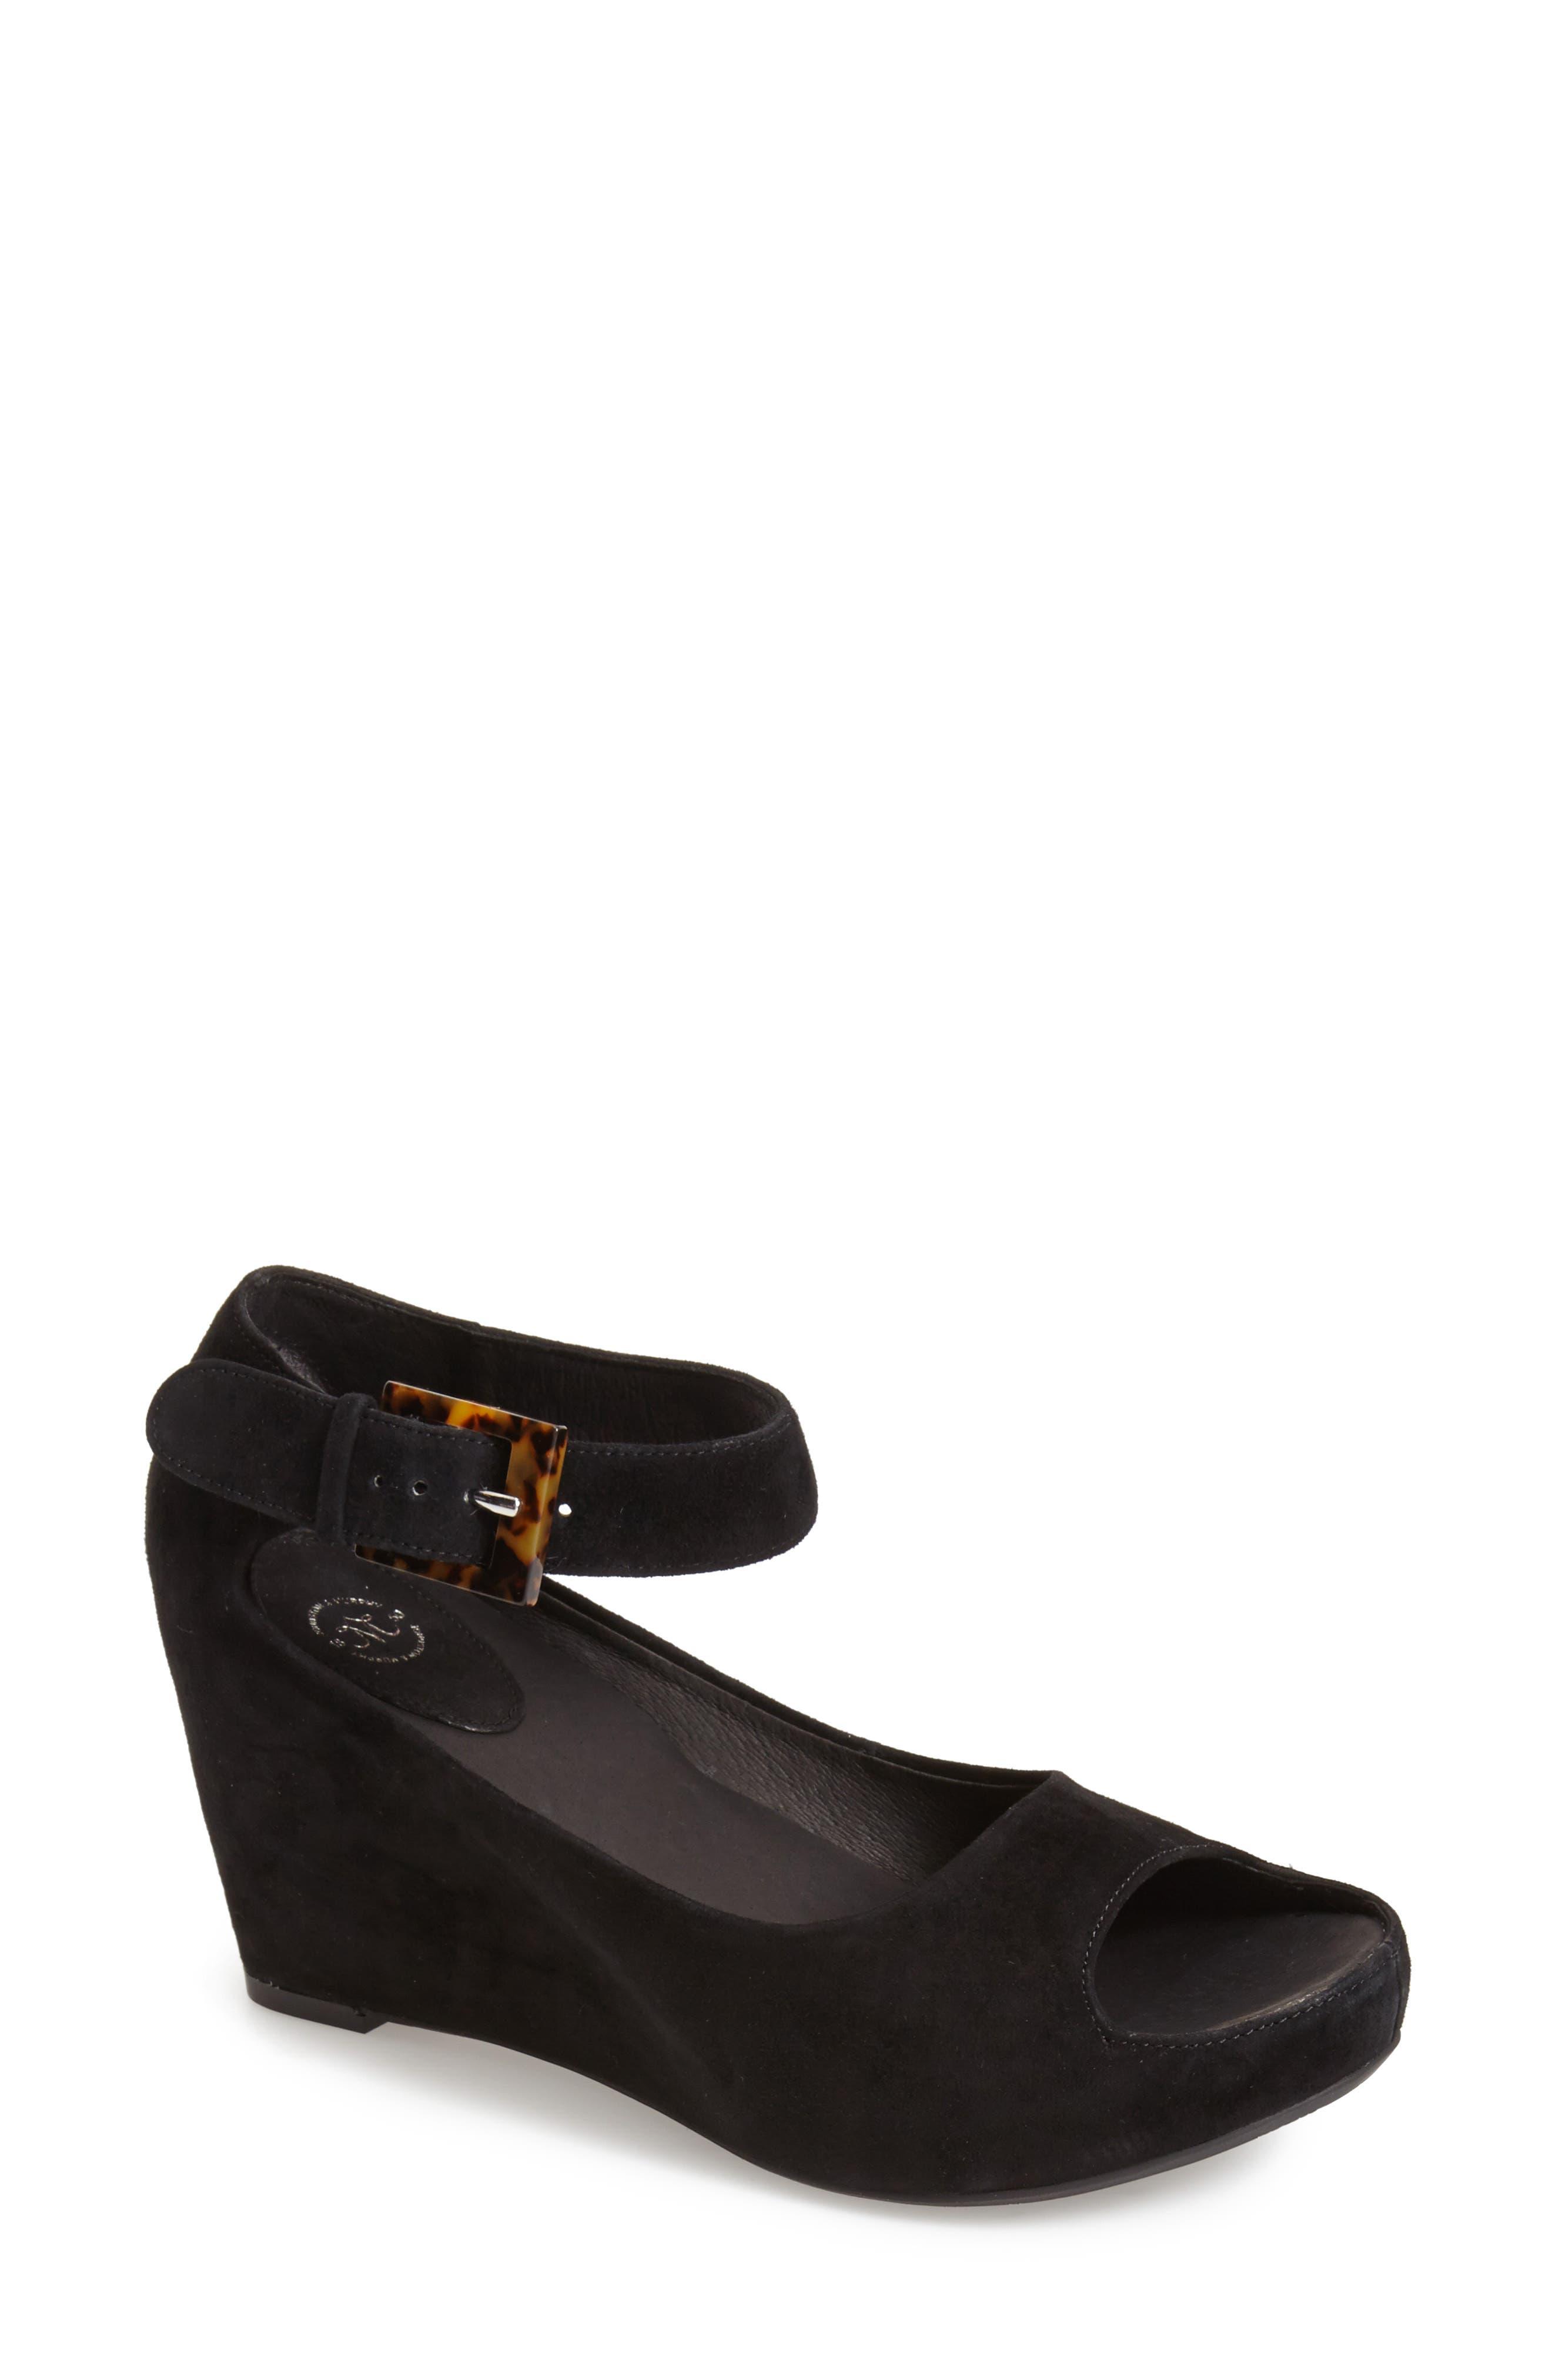 'Tricia' Ankle Strap Sandal,                             Alternate thumbnail 35, color,